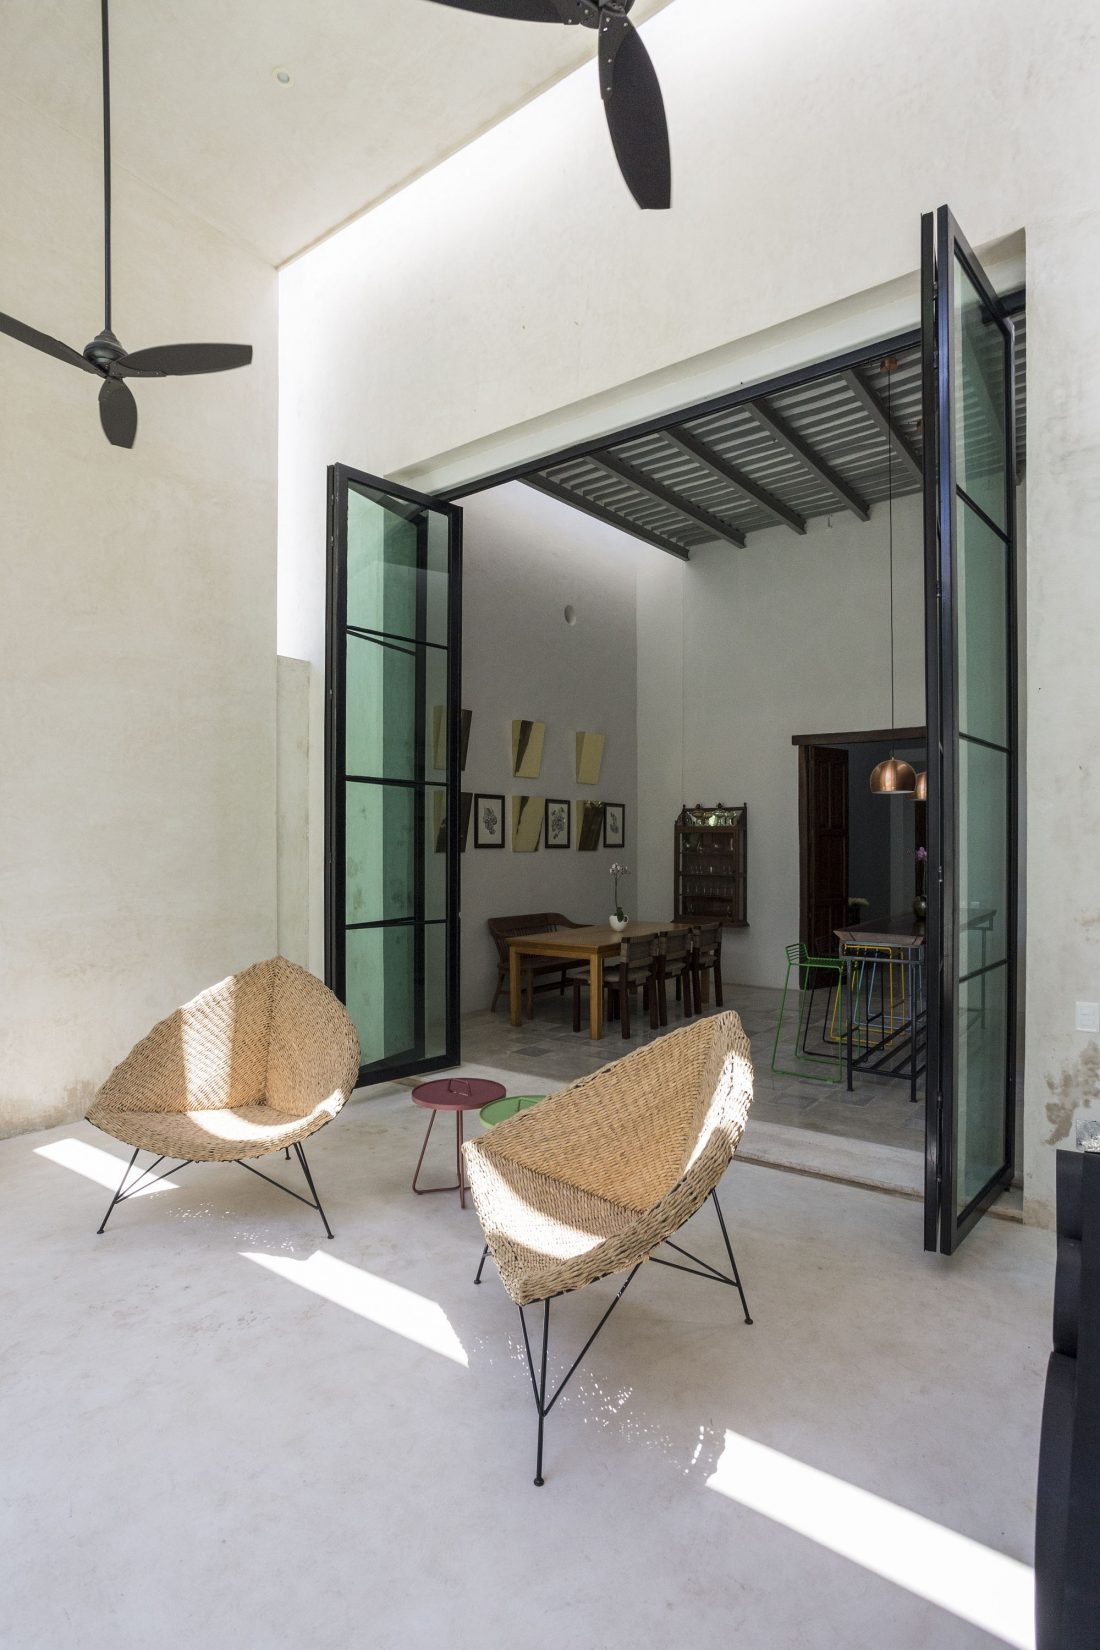 limonnyj-dom-v-meksike-fotografii-interera-9